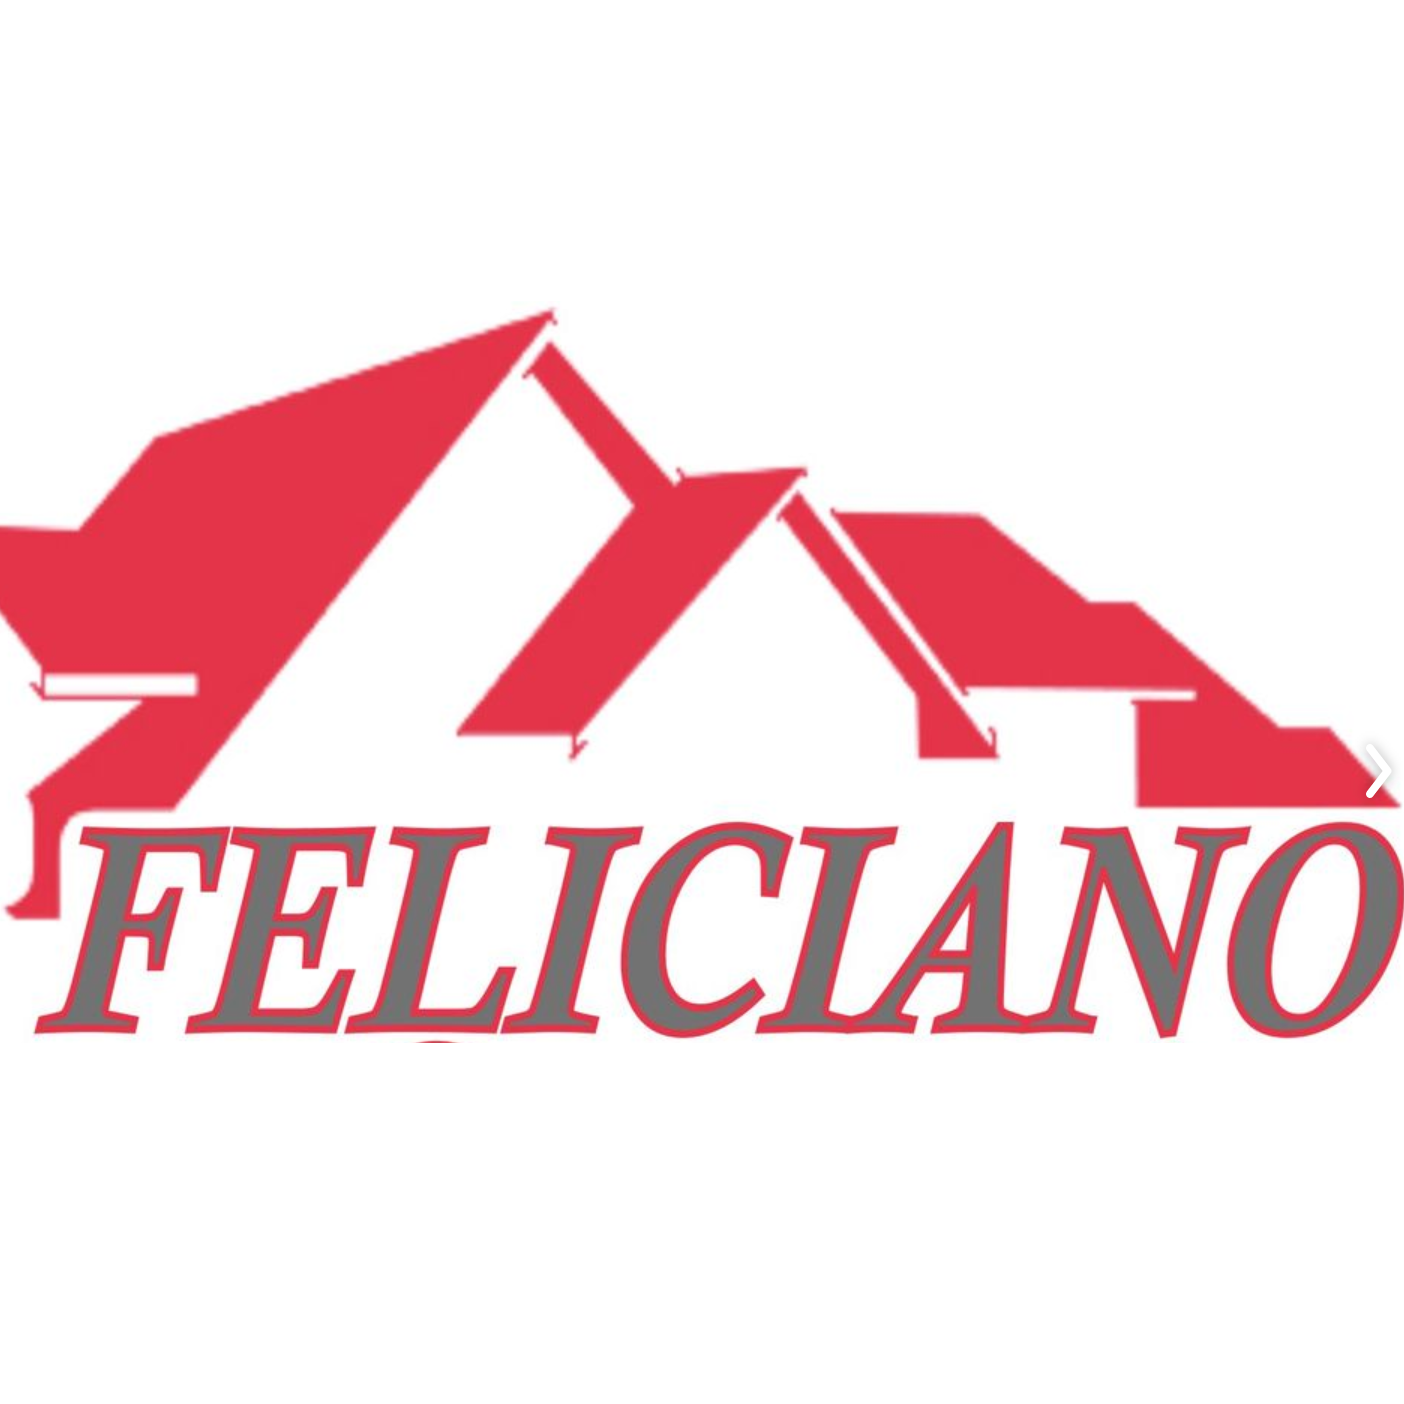 Feliciano Roofing Inc.